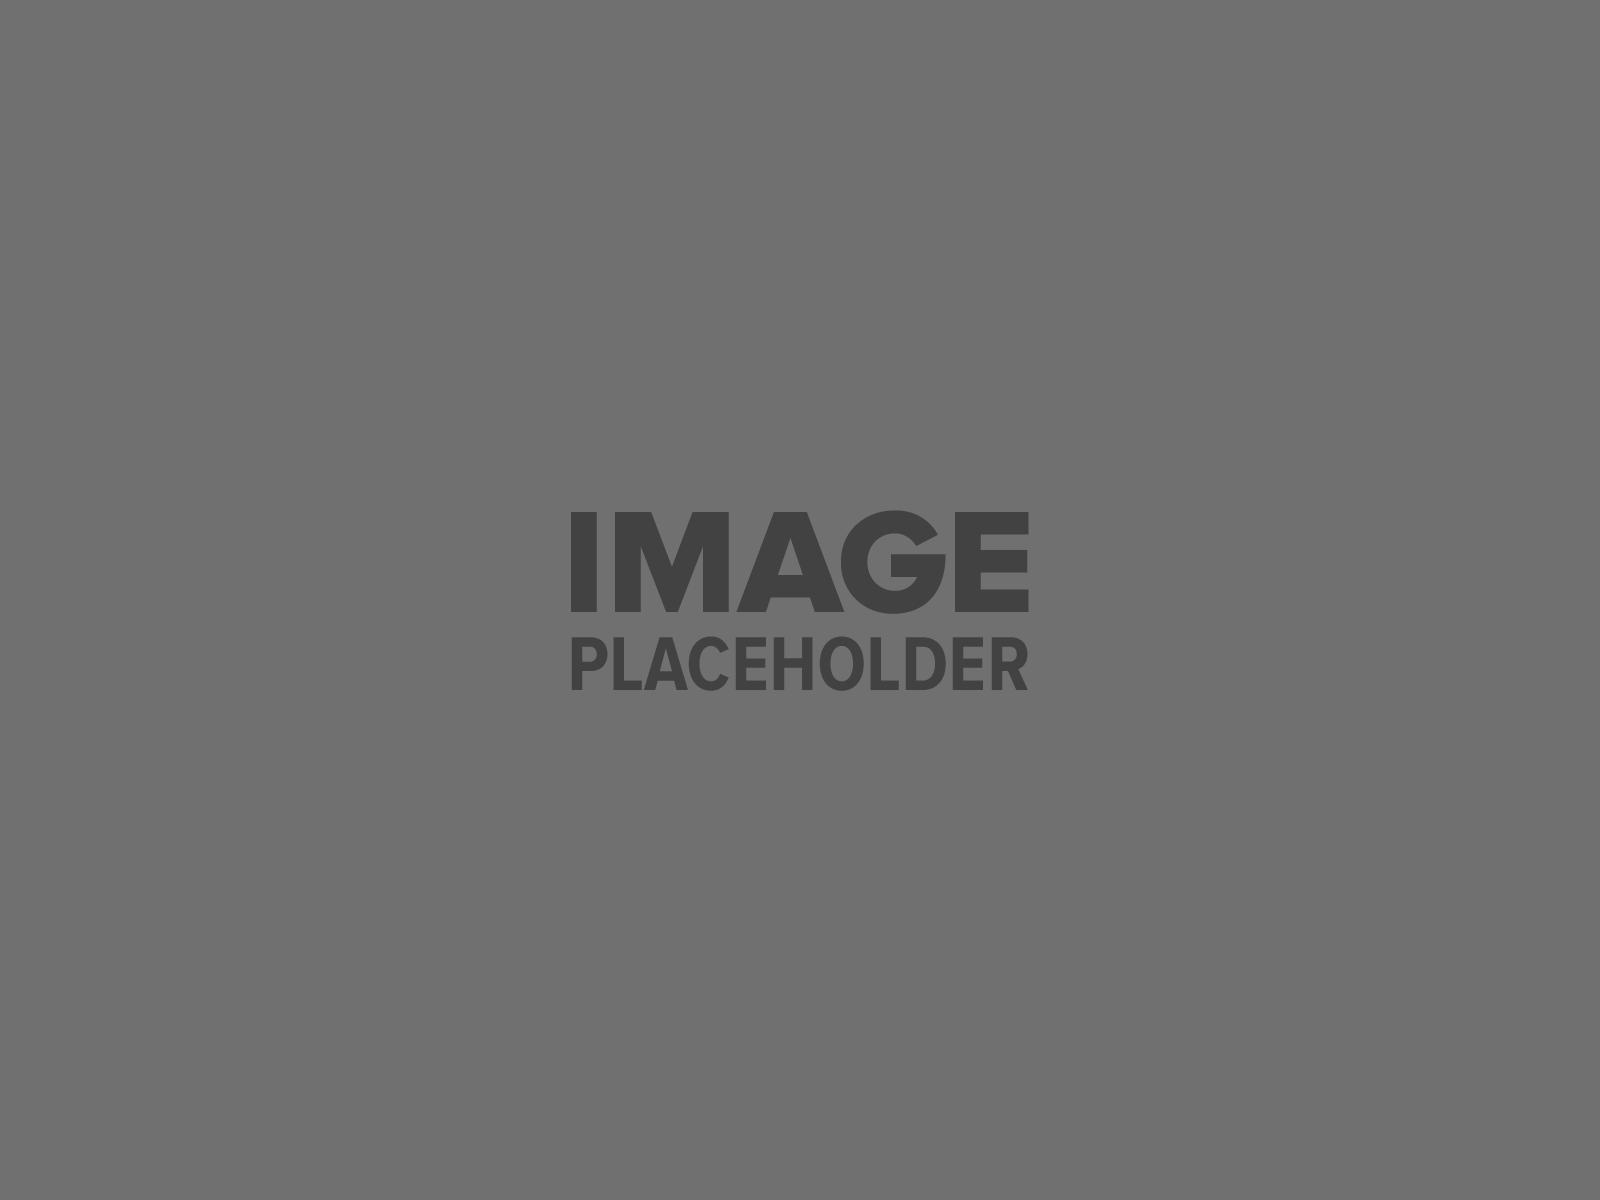 pojo-placeholder-2